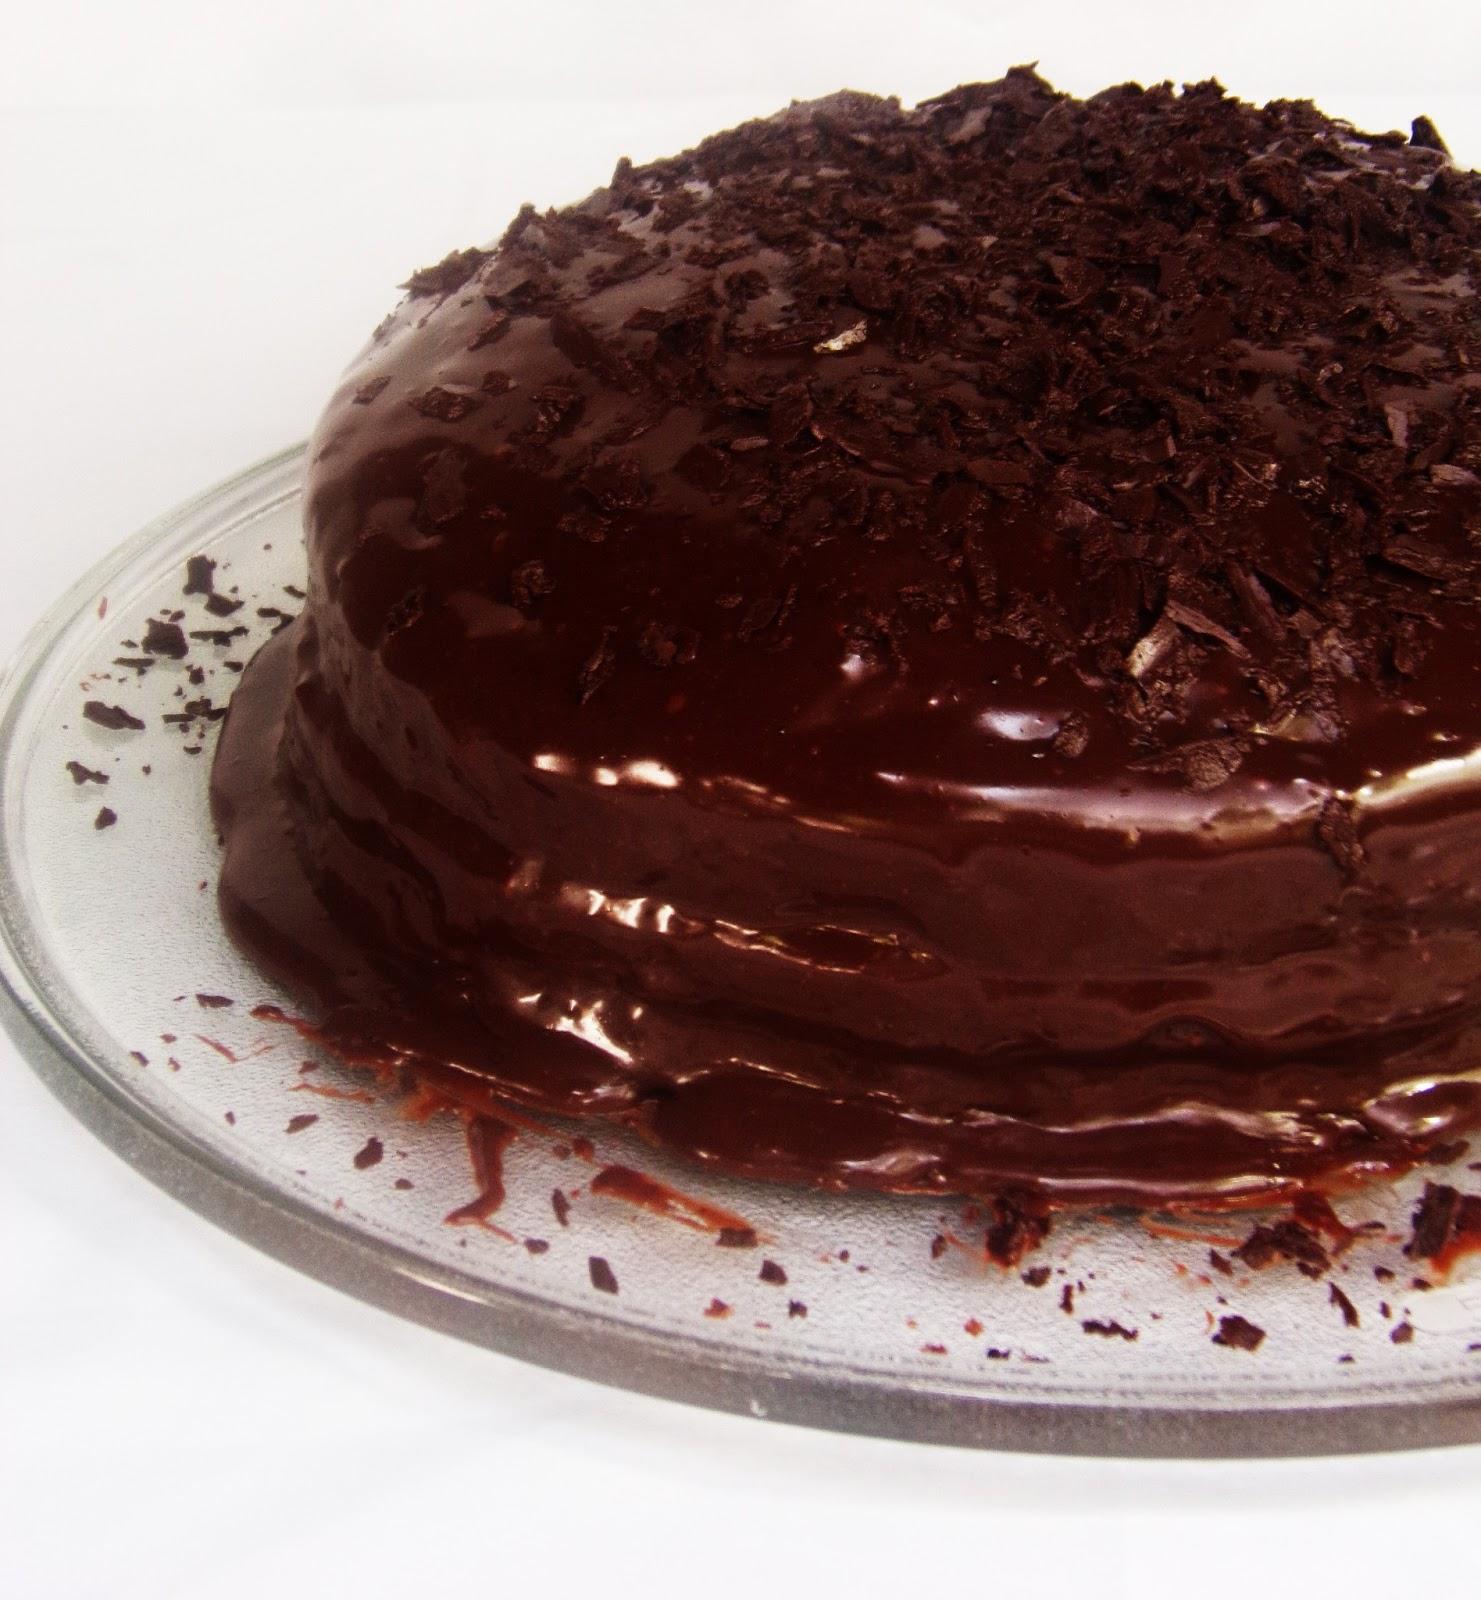 Filipino chocolate cake recipes